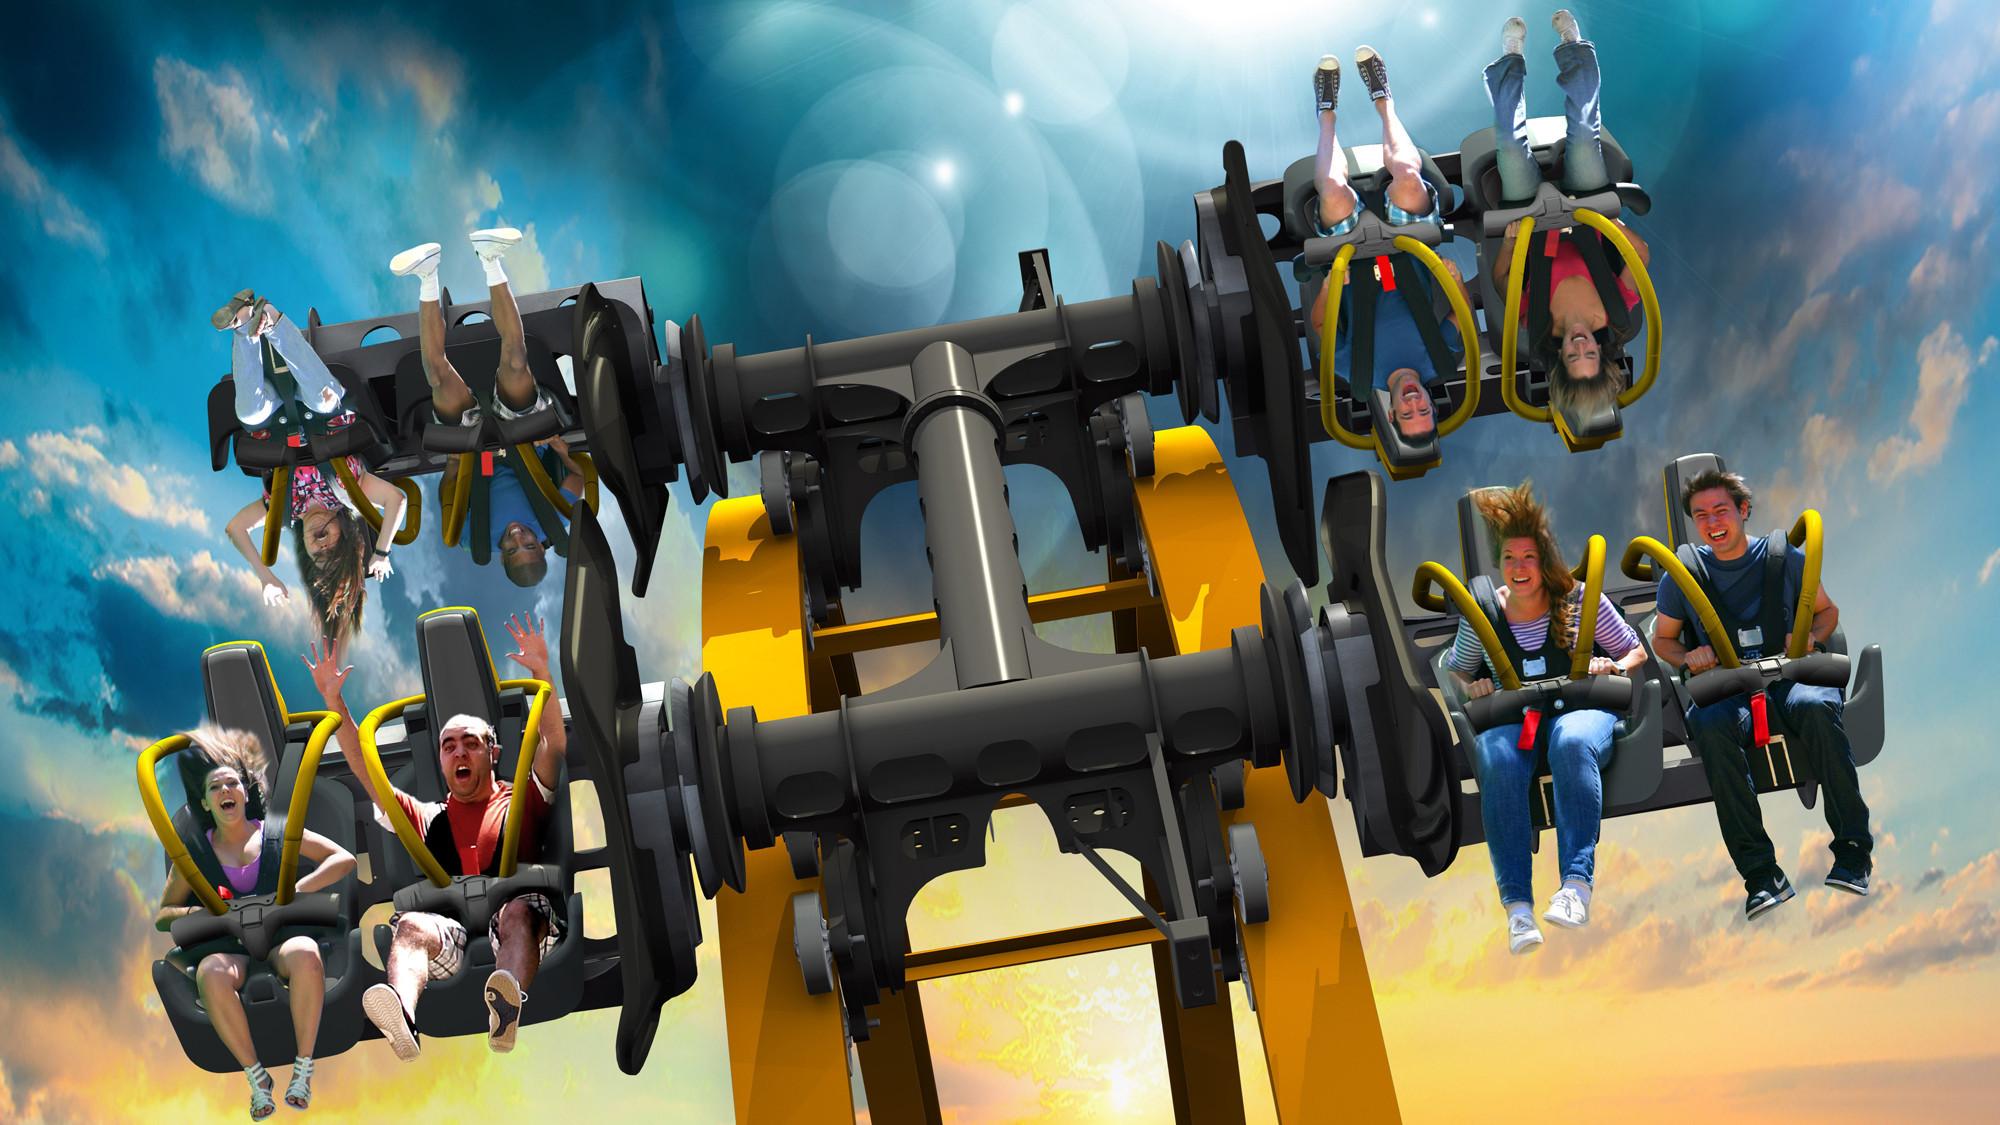 Six Flags Seats Six Flags Fiesta Texas Puts a